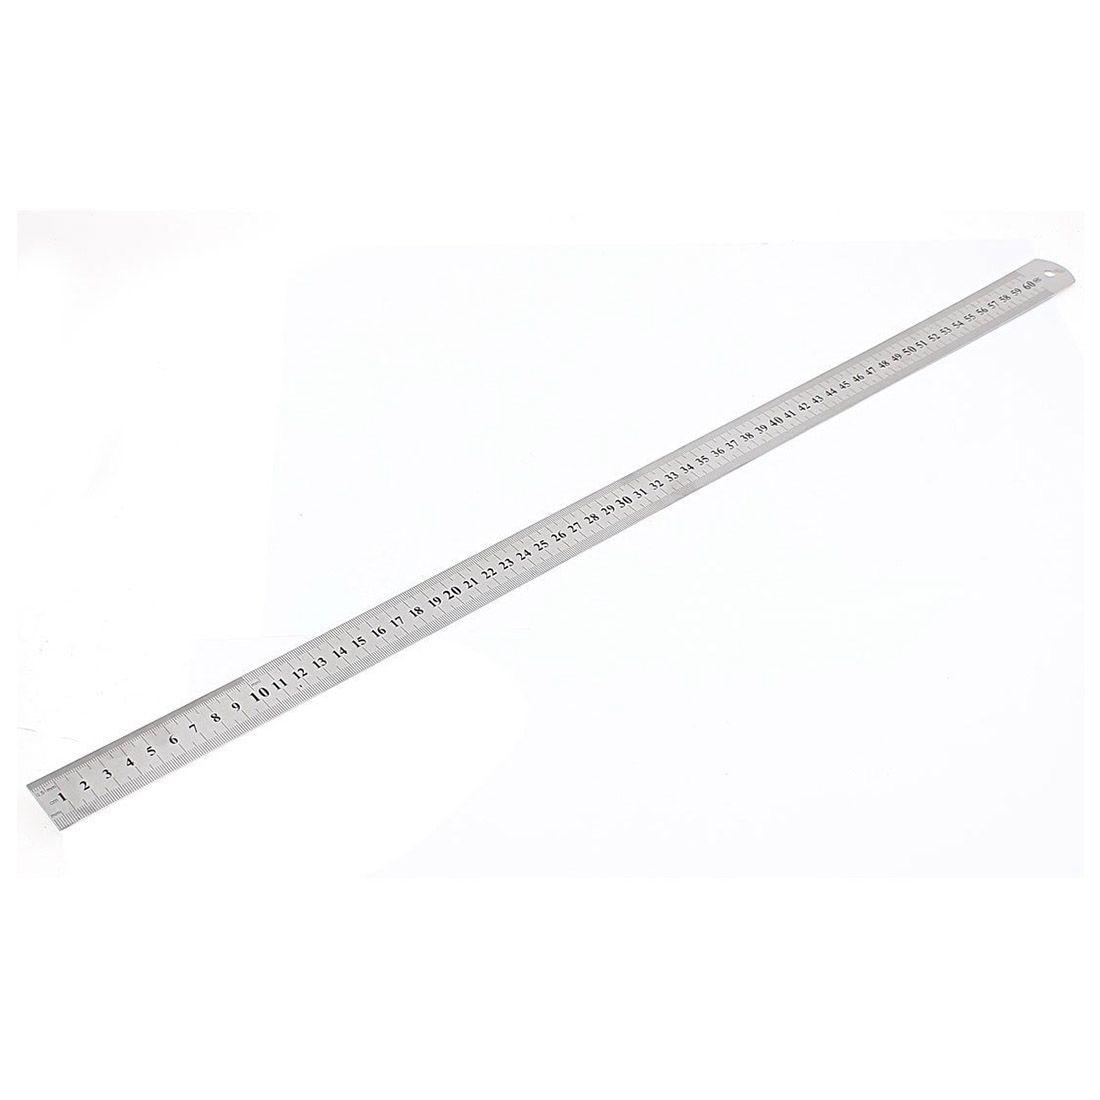 Stainless Steel Double Side Measuring Straight Edge Ruler 60cm/24